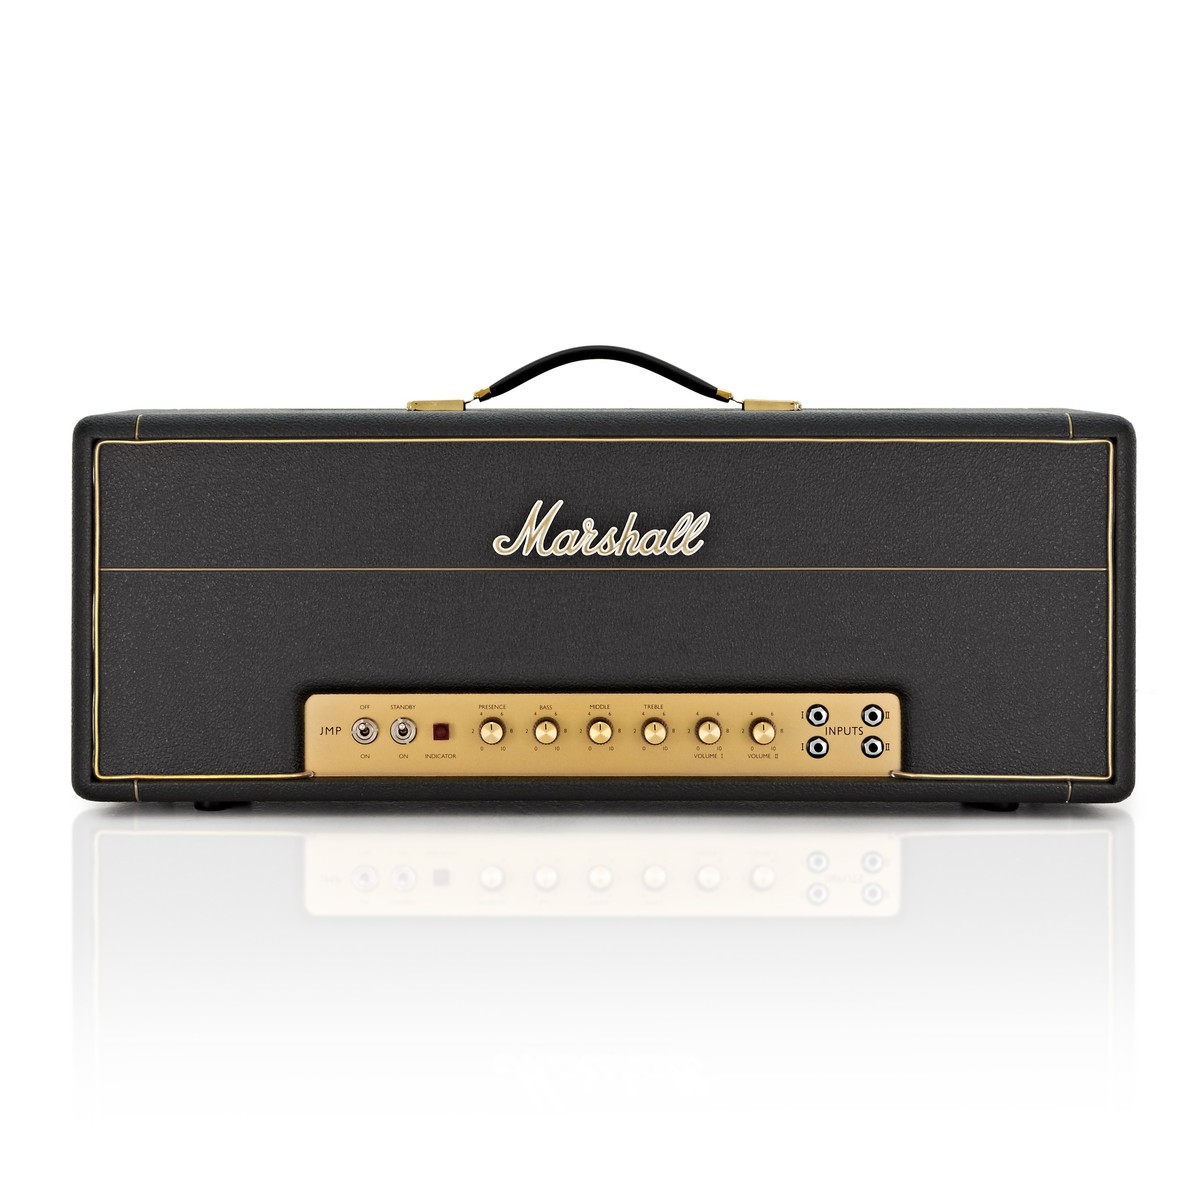 hight resolution of marshall 1959hw handwired guitar tube amplifier head